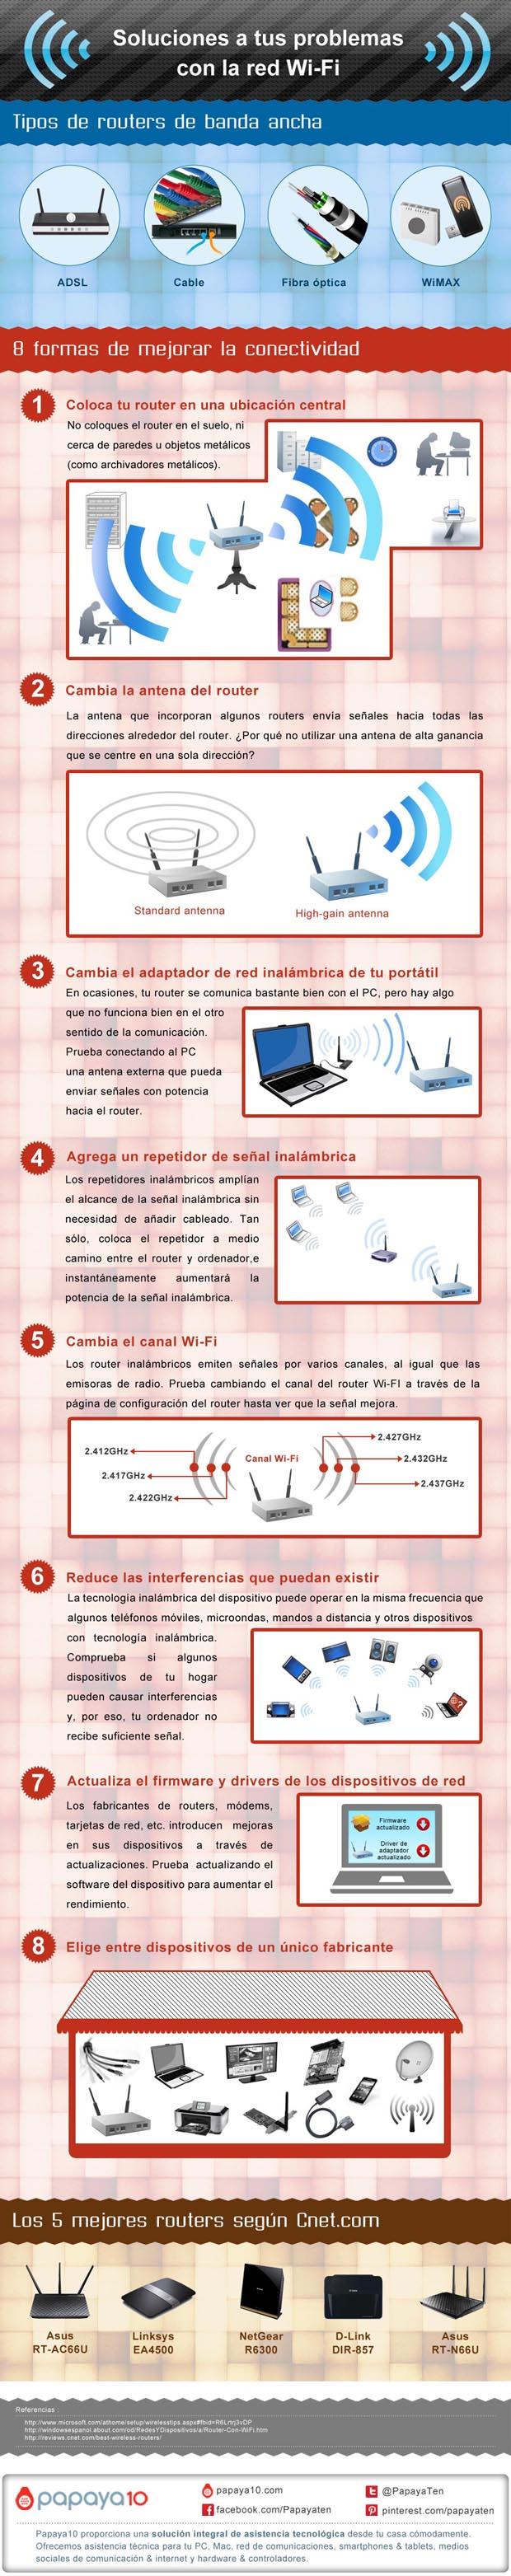 Soluciones-a-tus-problemas-con-la-red-Wi-Fi